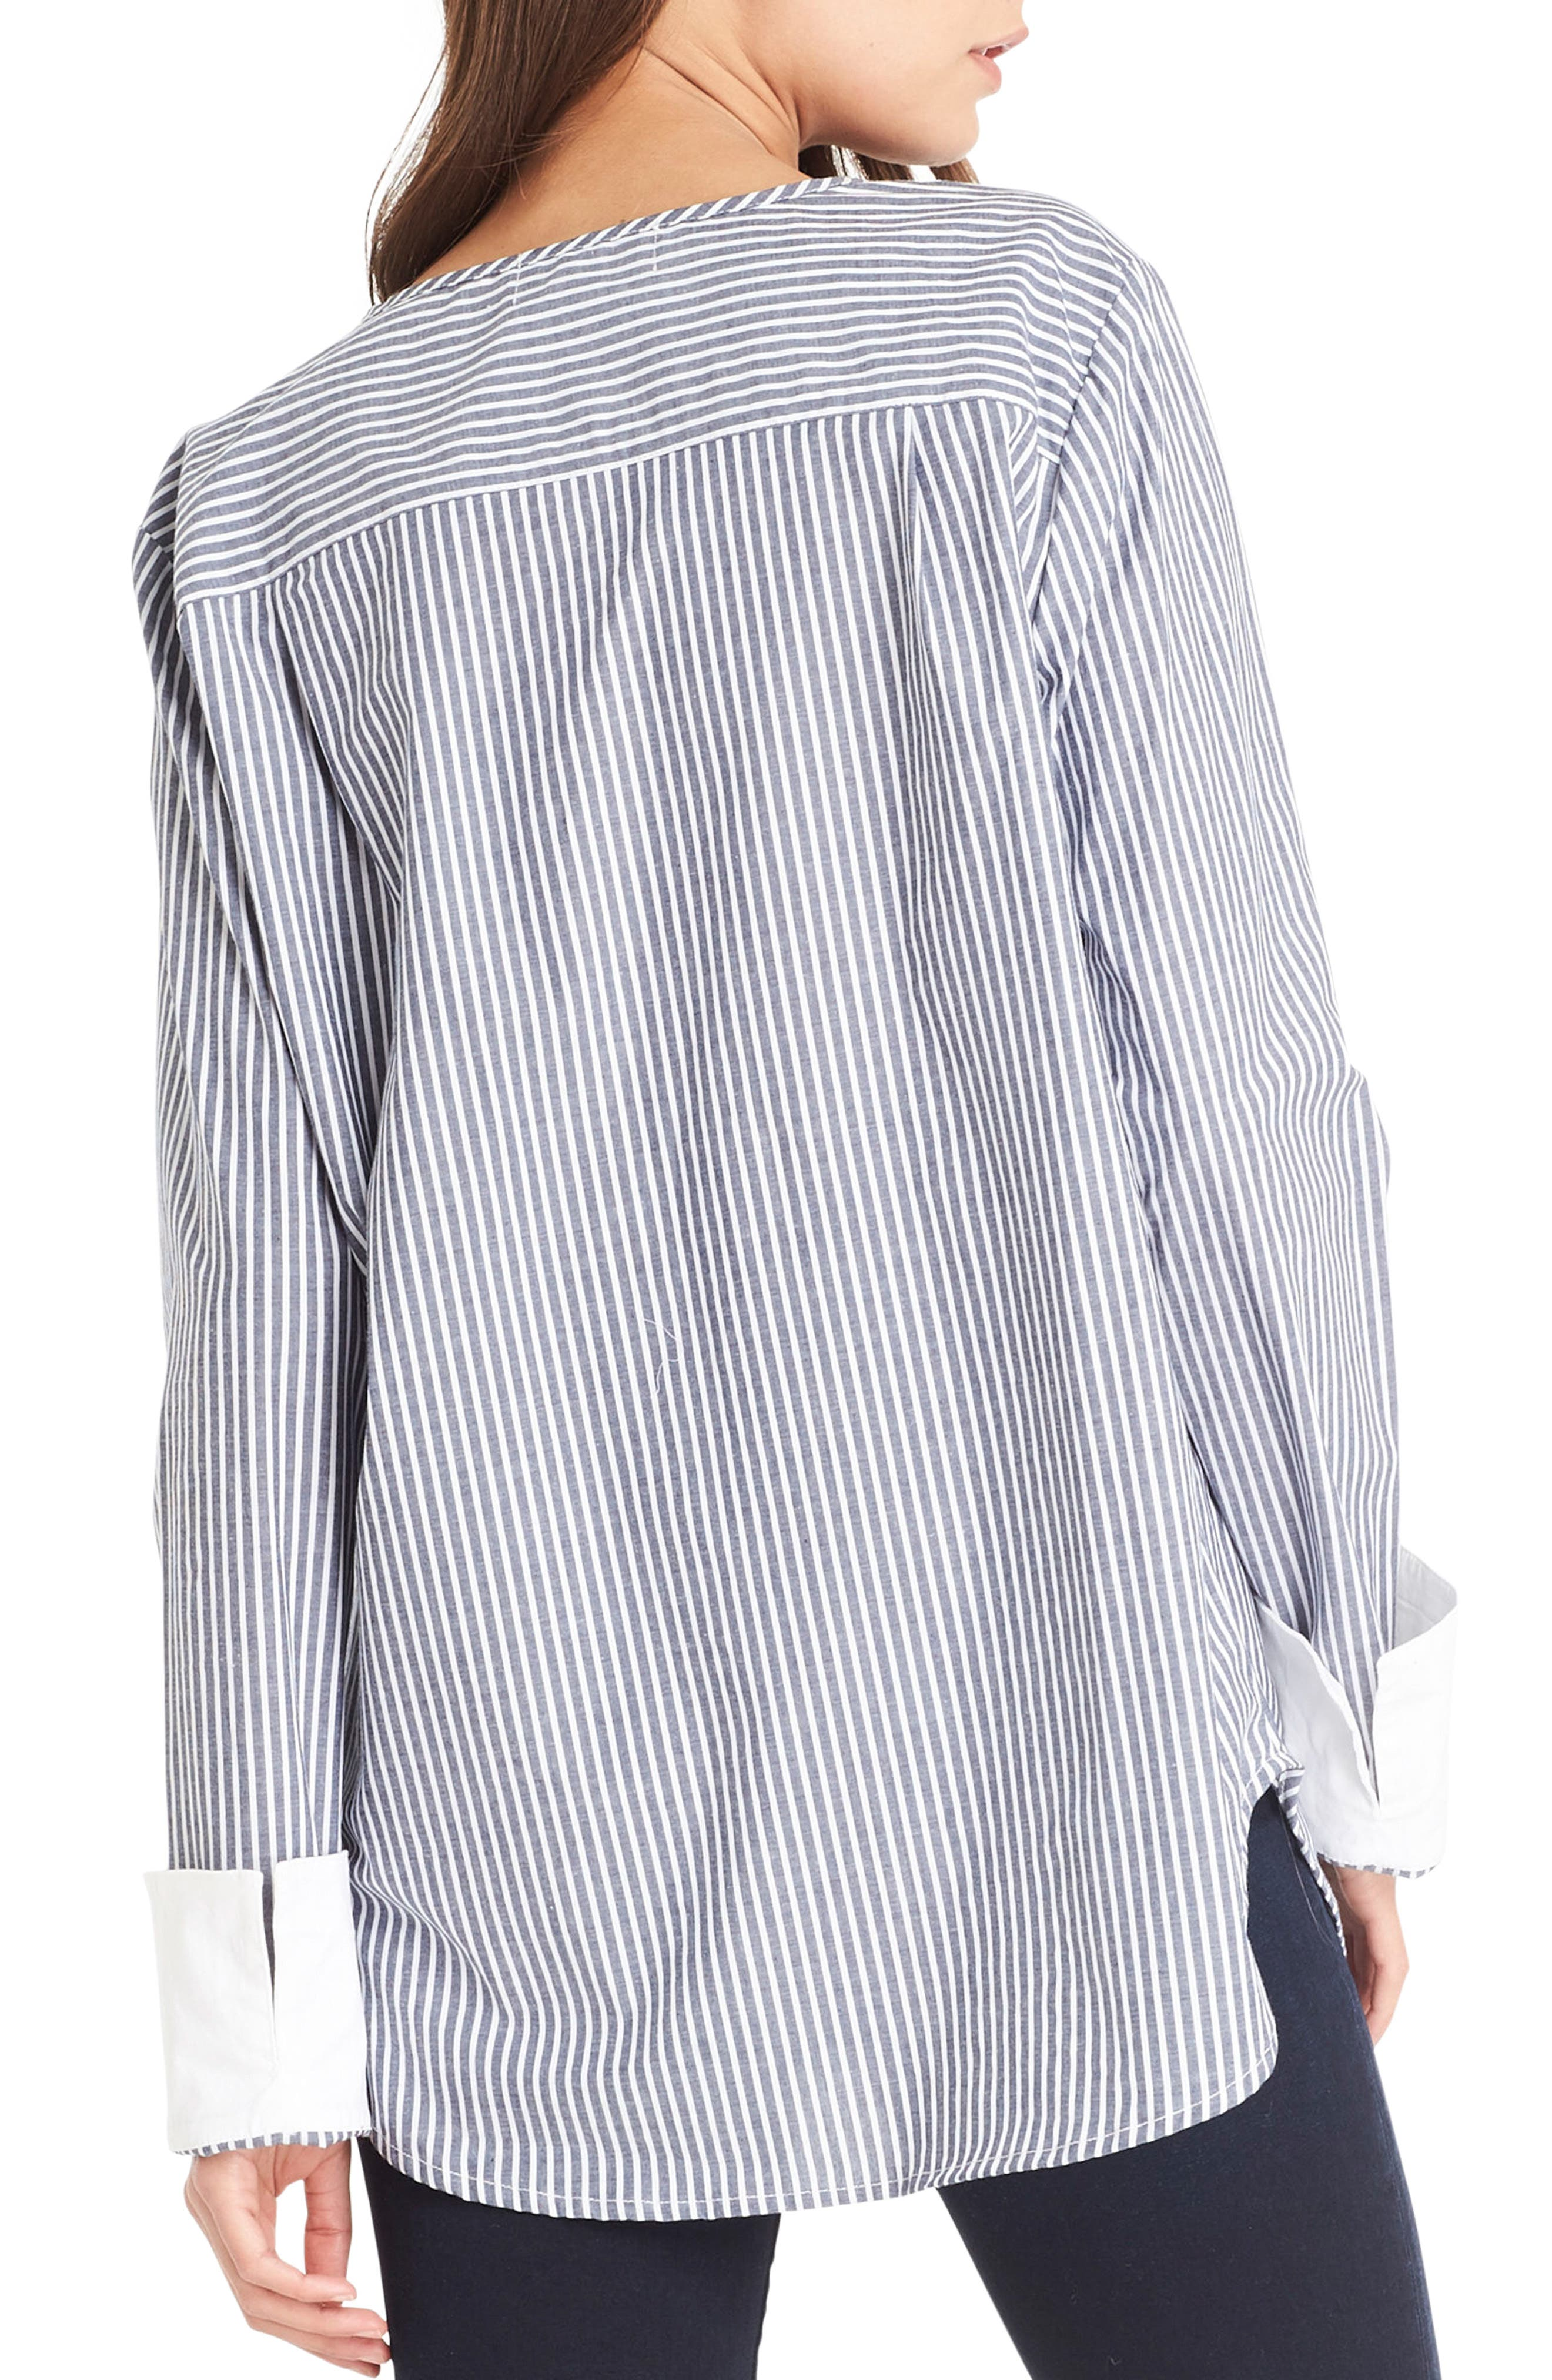 Contrast Cuff Shirt,                             Alternate thumbnail 2, color,                             Noct/ White